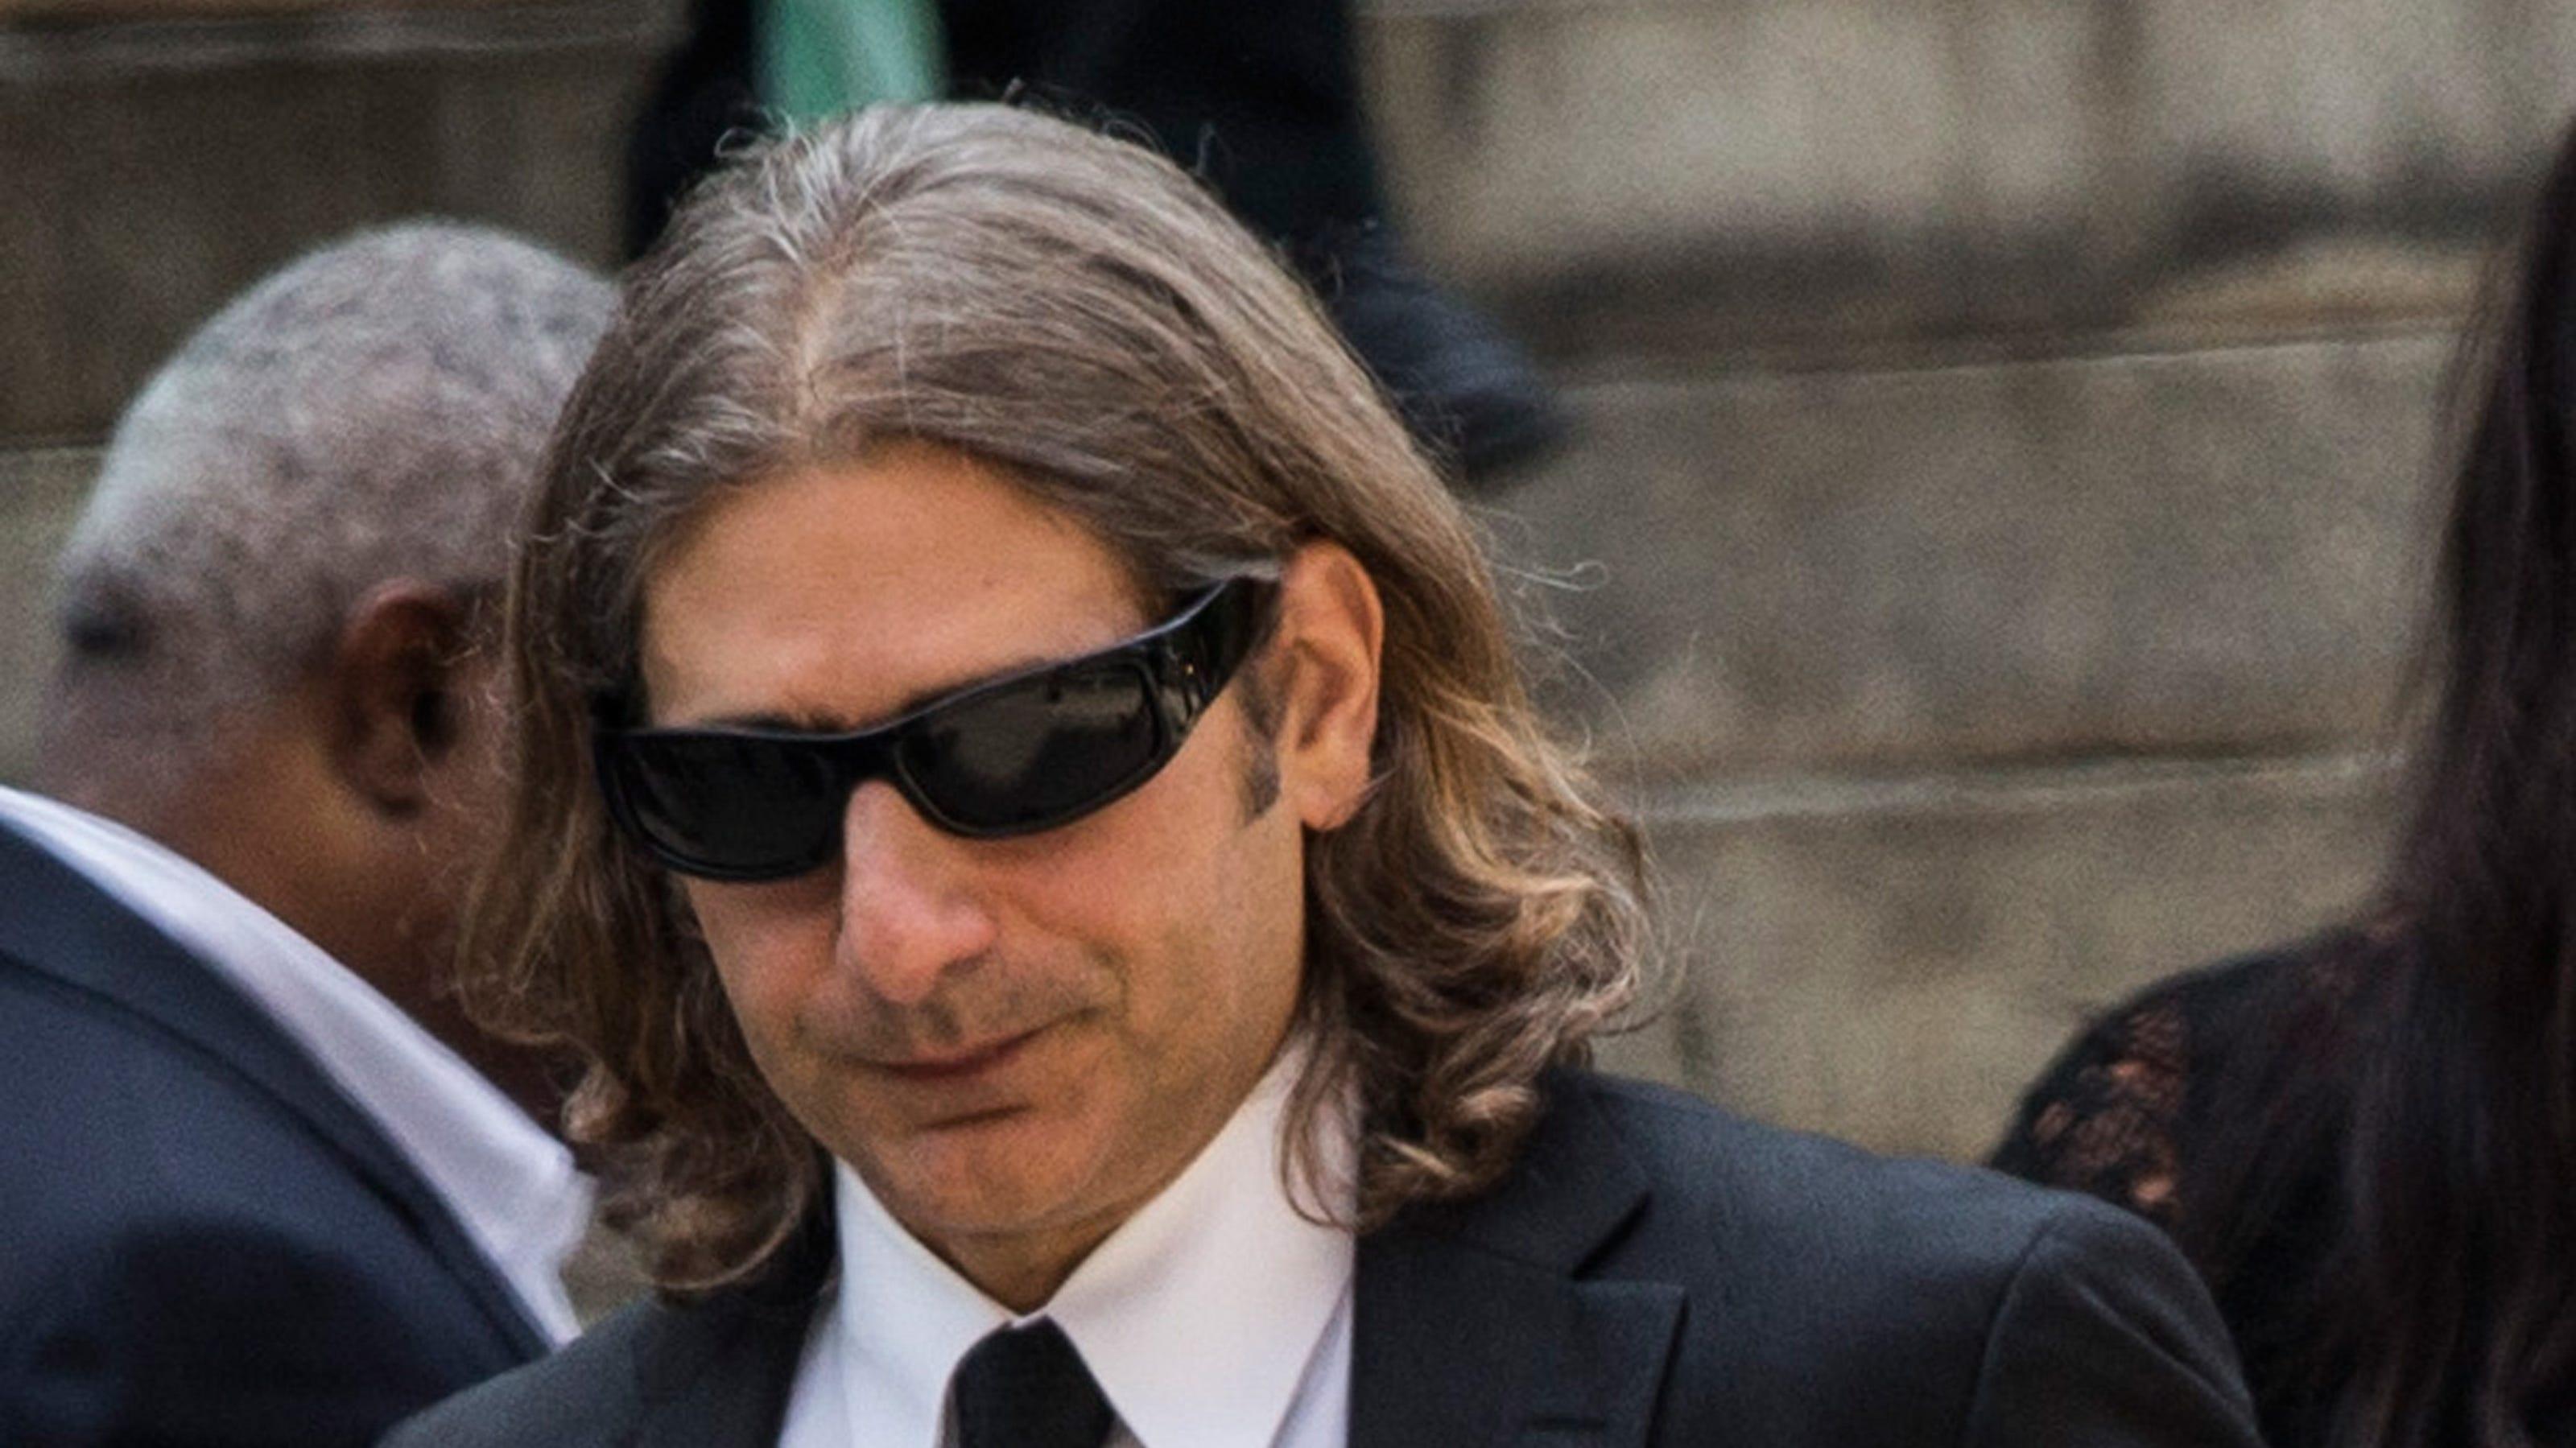 Sopranos cast turns out for James Gandolfini s funeral